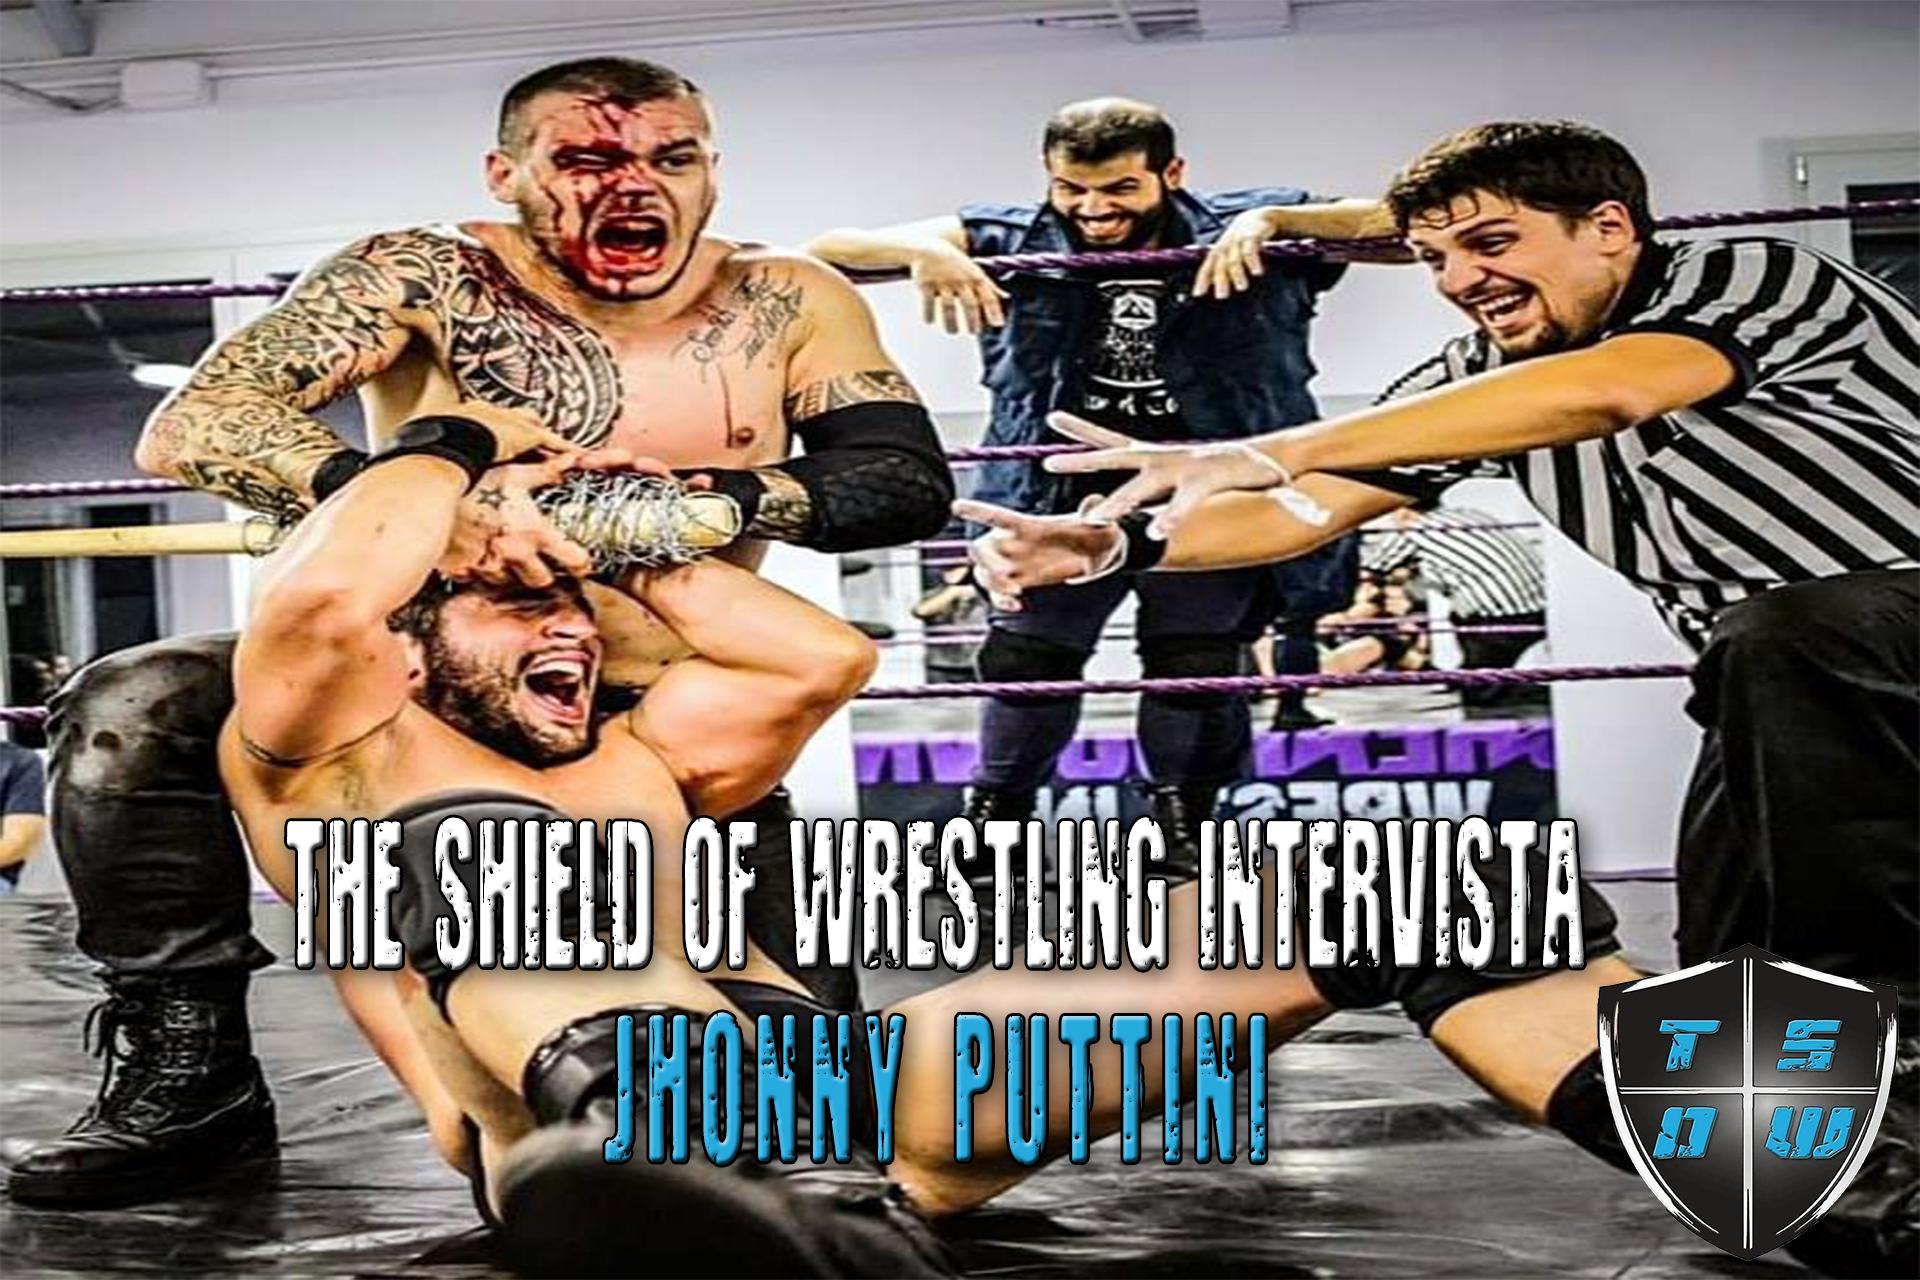 Intervista a Jhonny Puttini